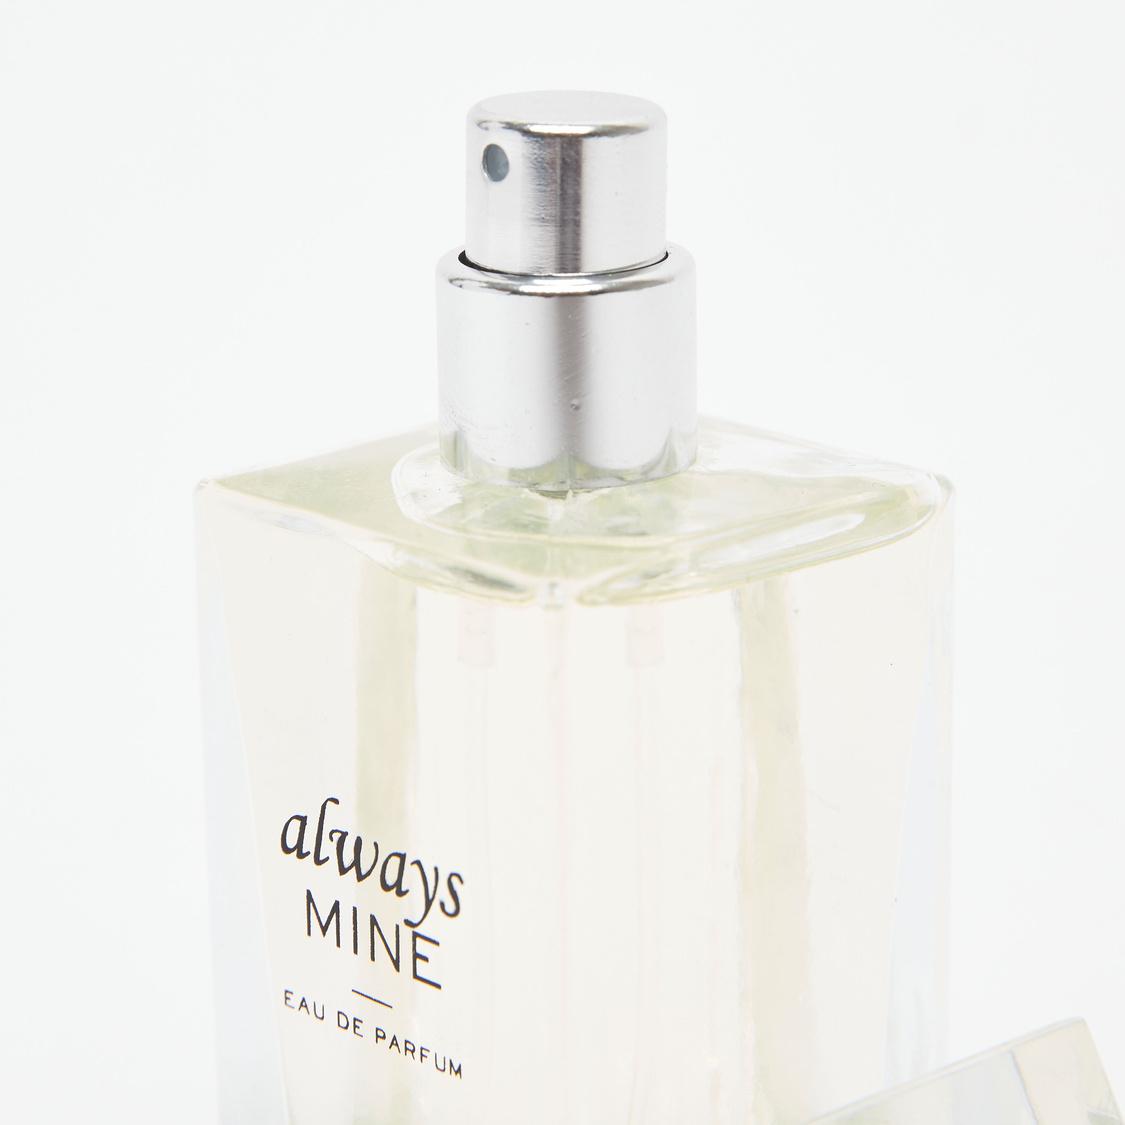 Always Mine Eau De Parfum - 50 ml